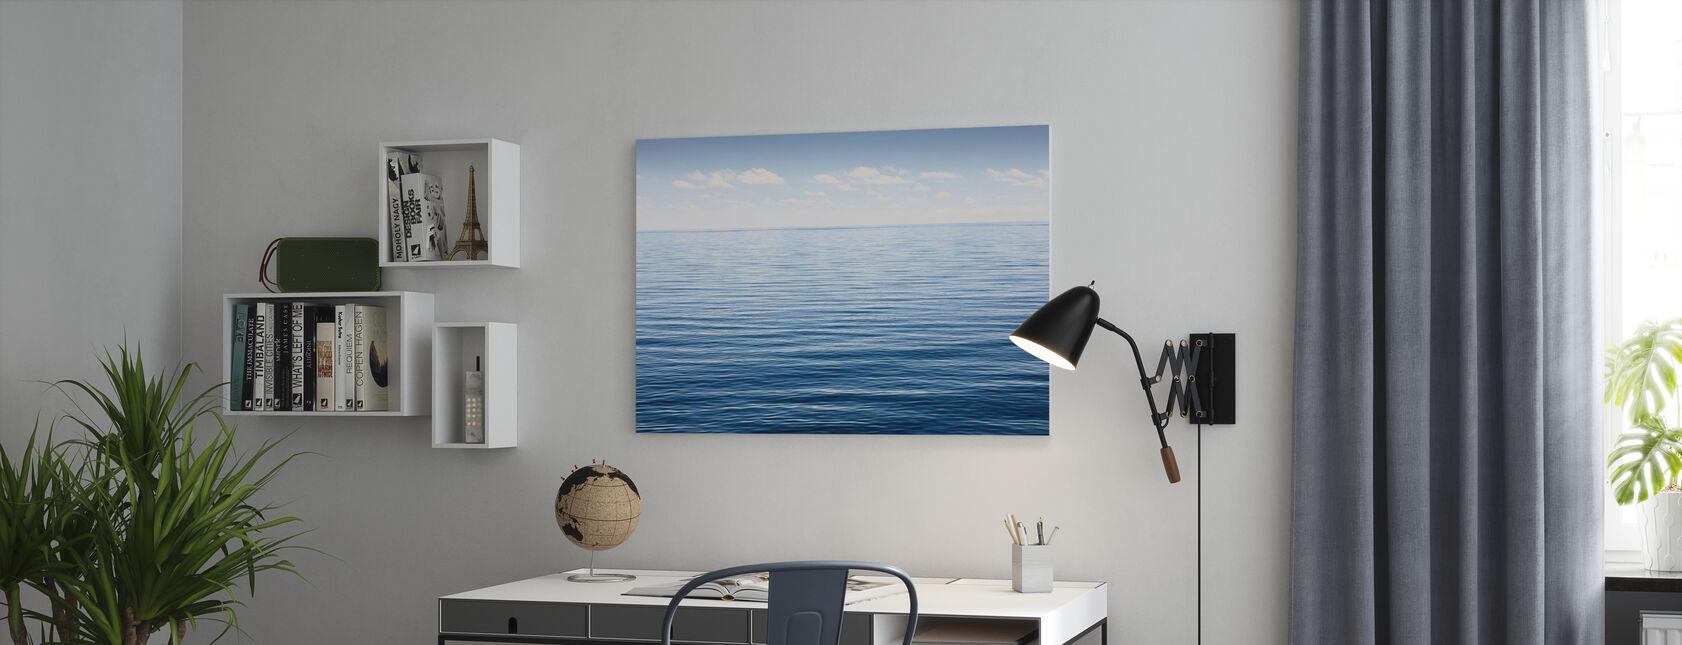 Endloses Meer - Leinwandbild - Büro